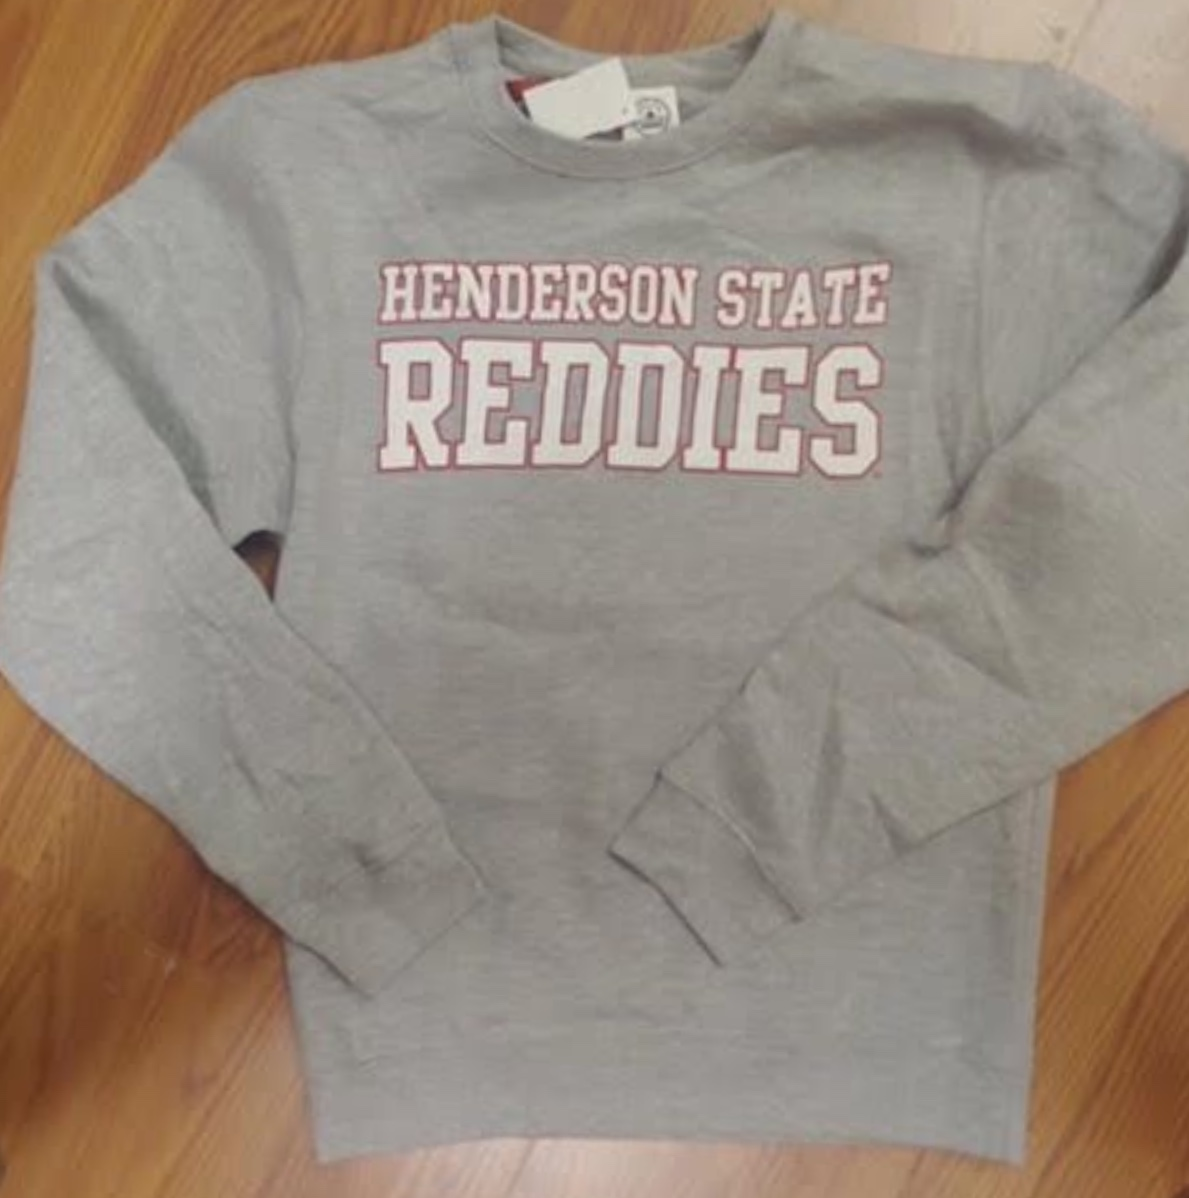 Henderson State Reddies Crewneck Sweatshirt